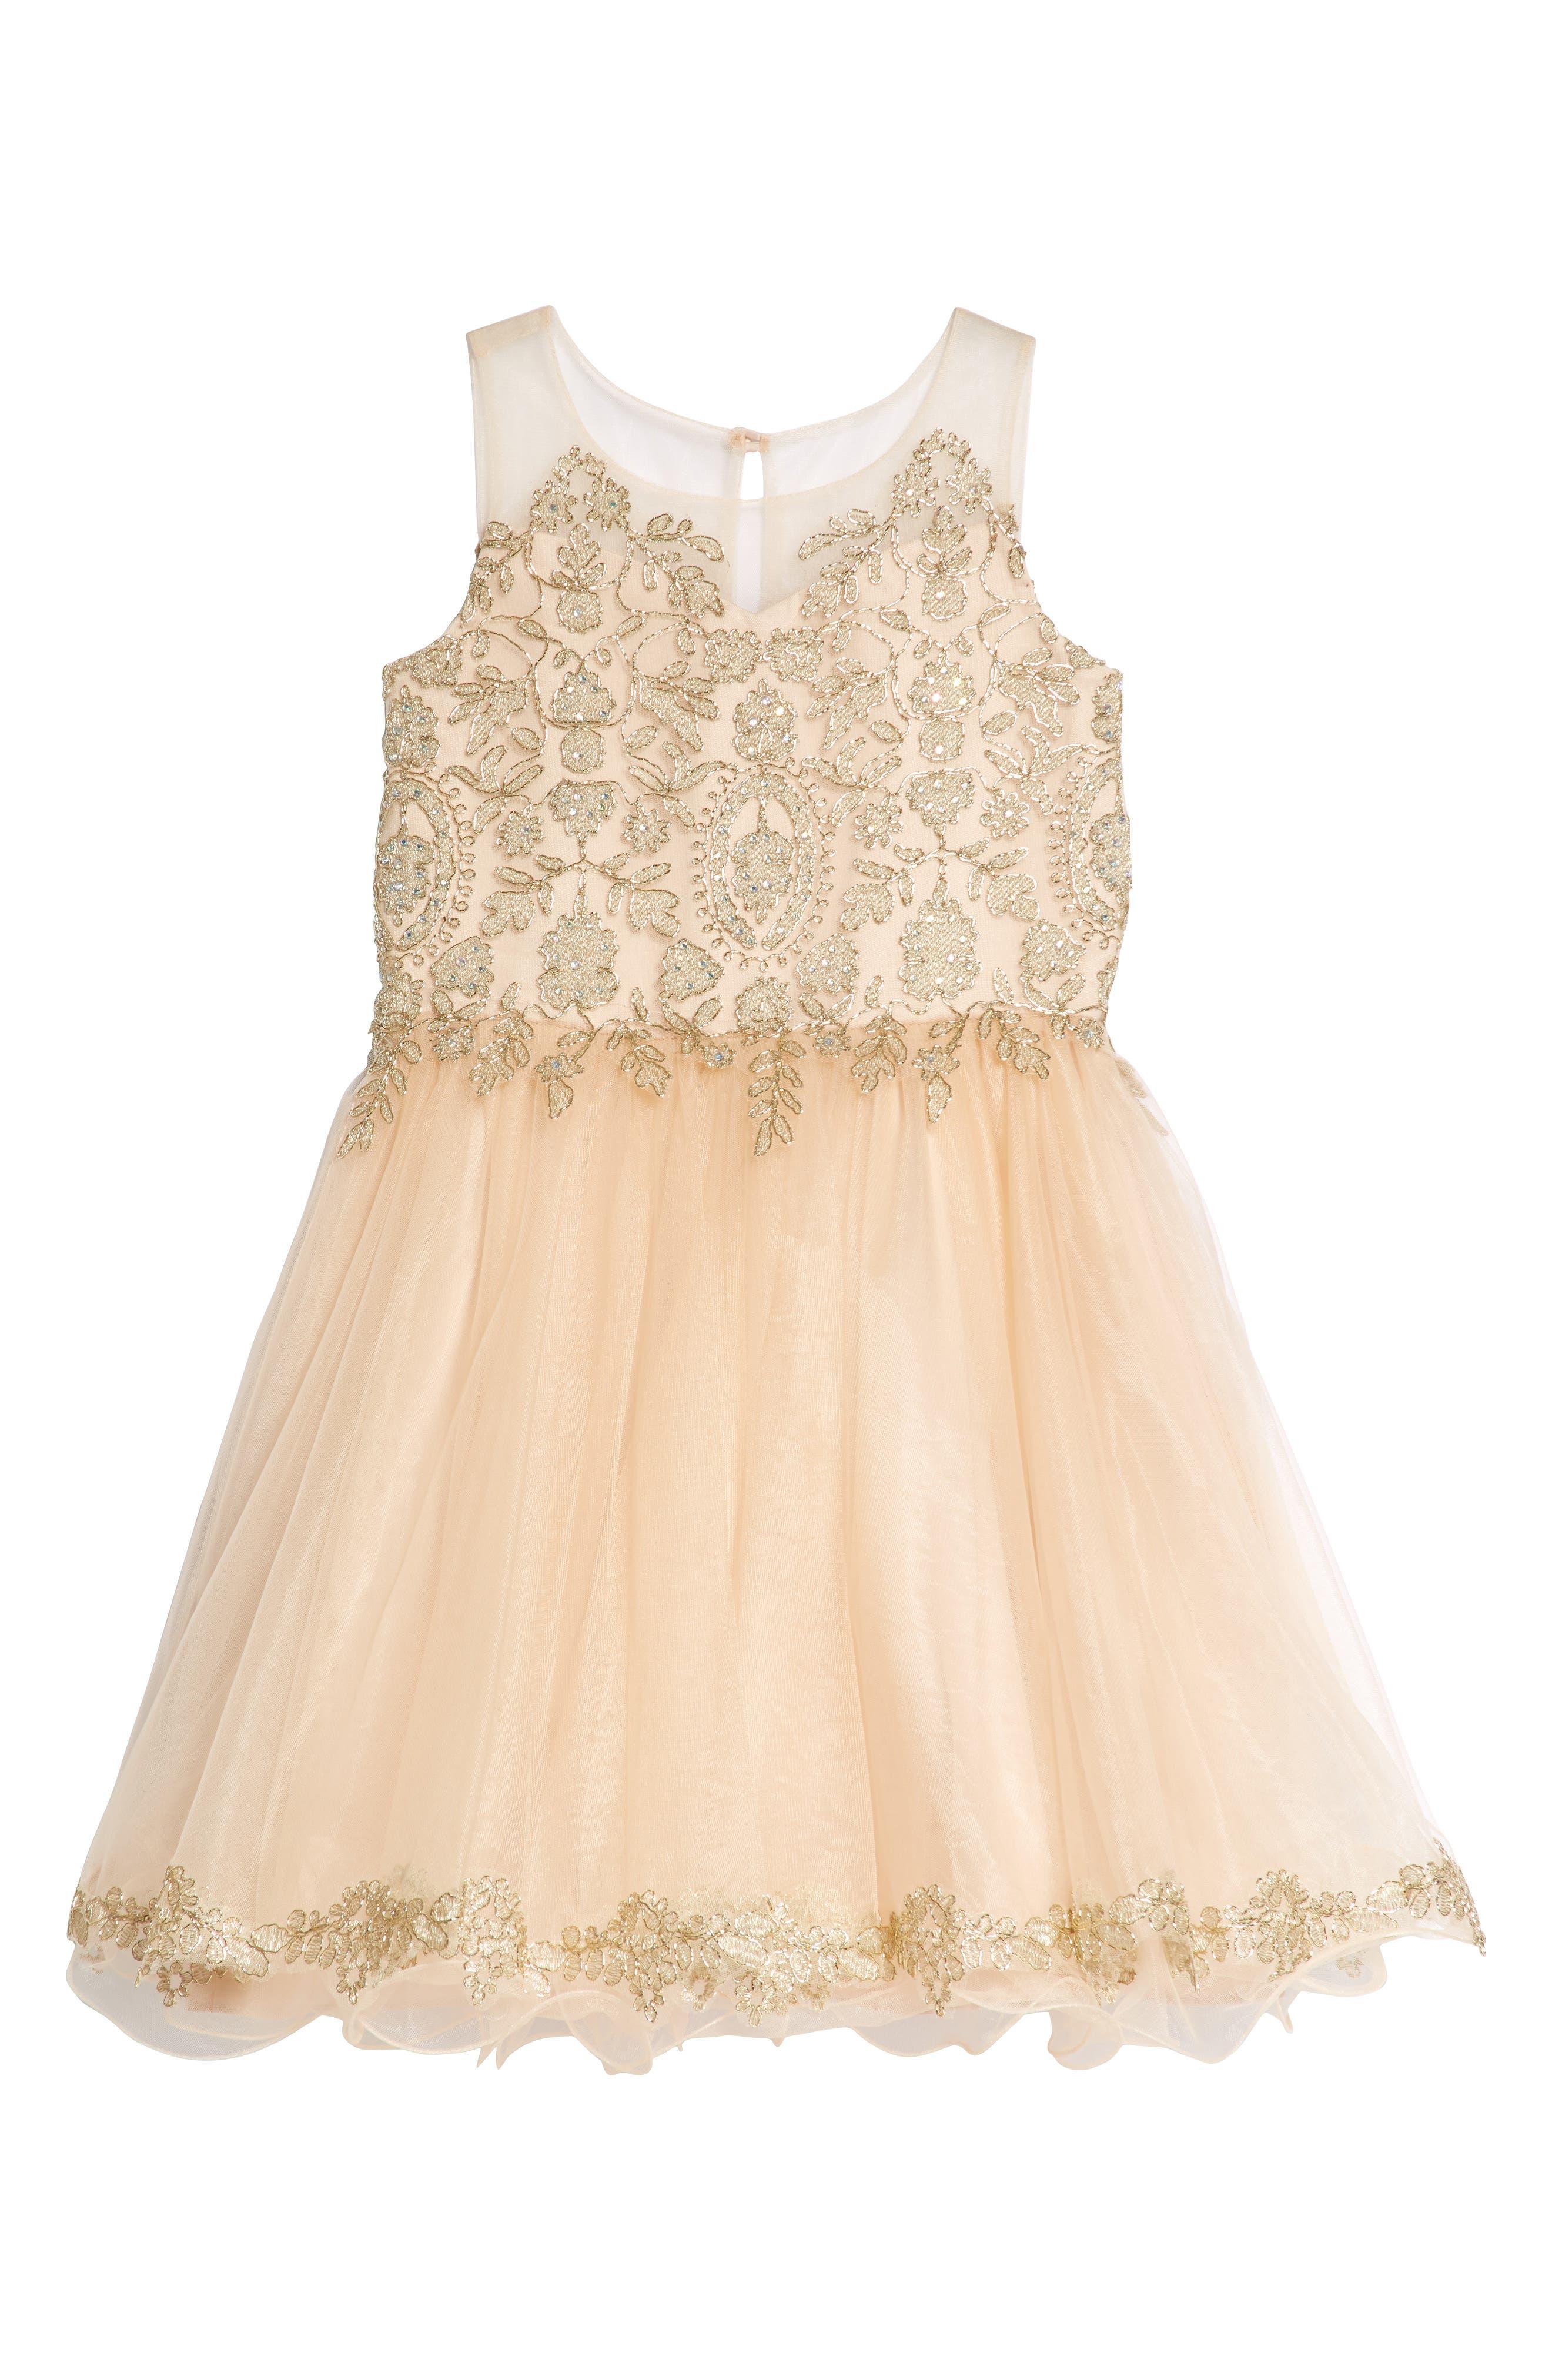 Main Image - BLUSH by Us Angels Illusion Beaded Mesh Dress (Big Girls)